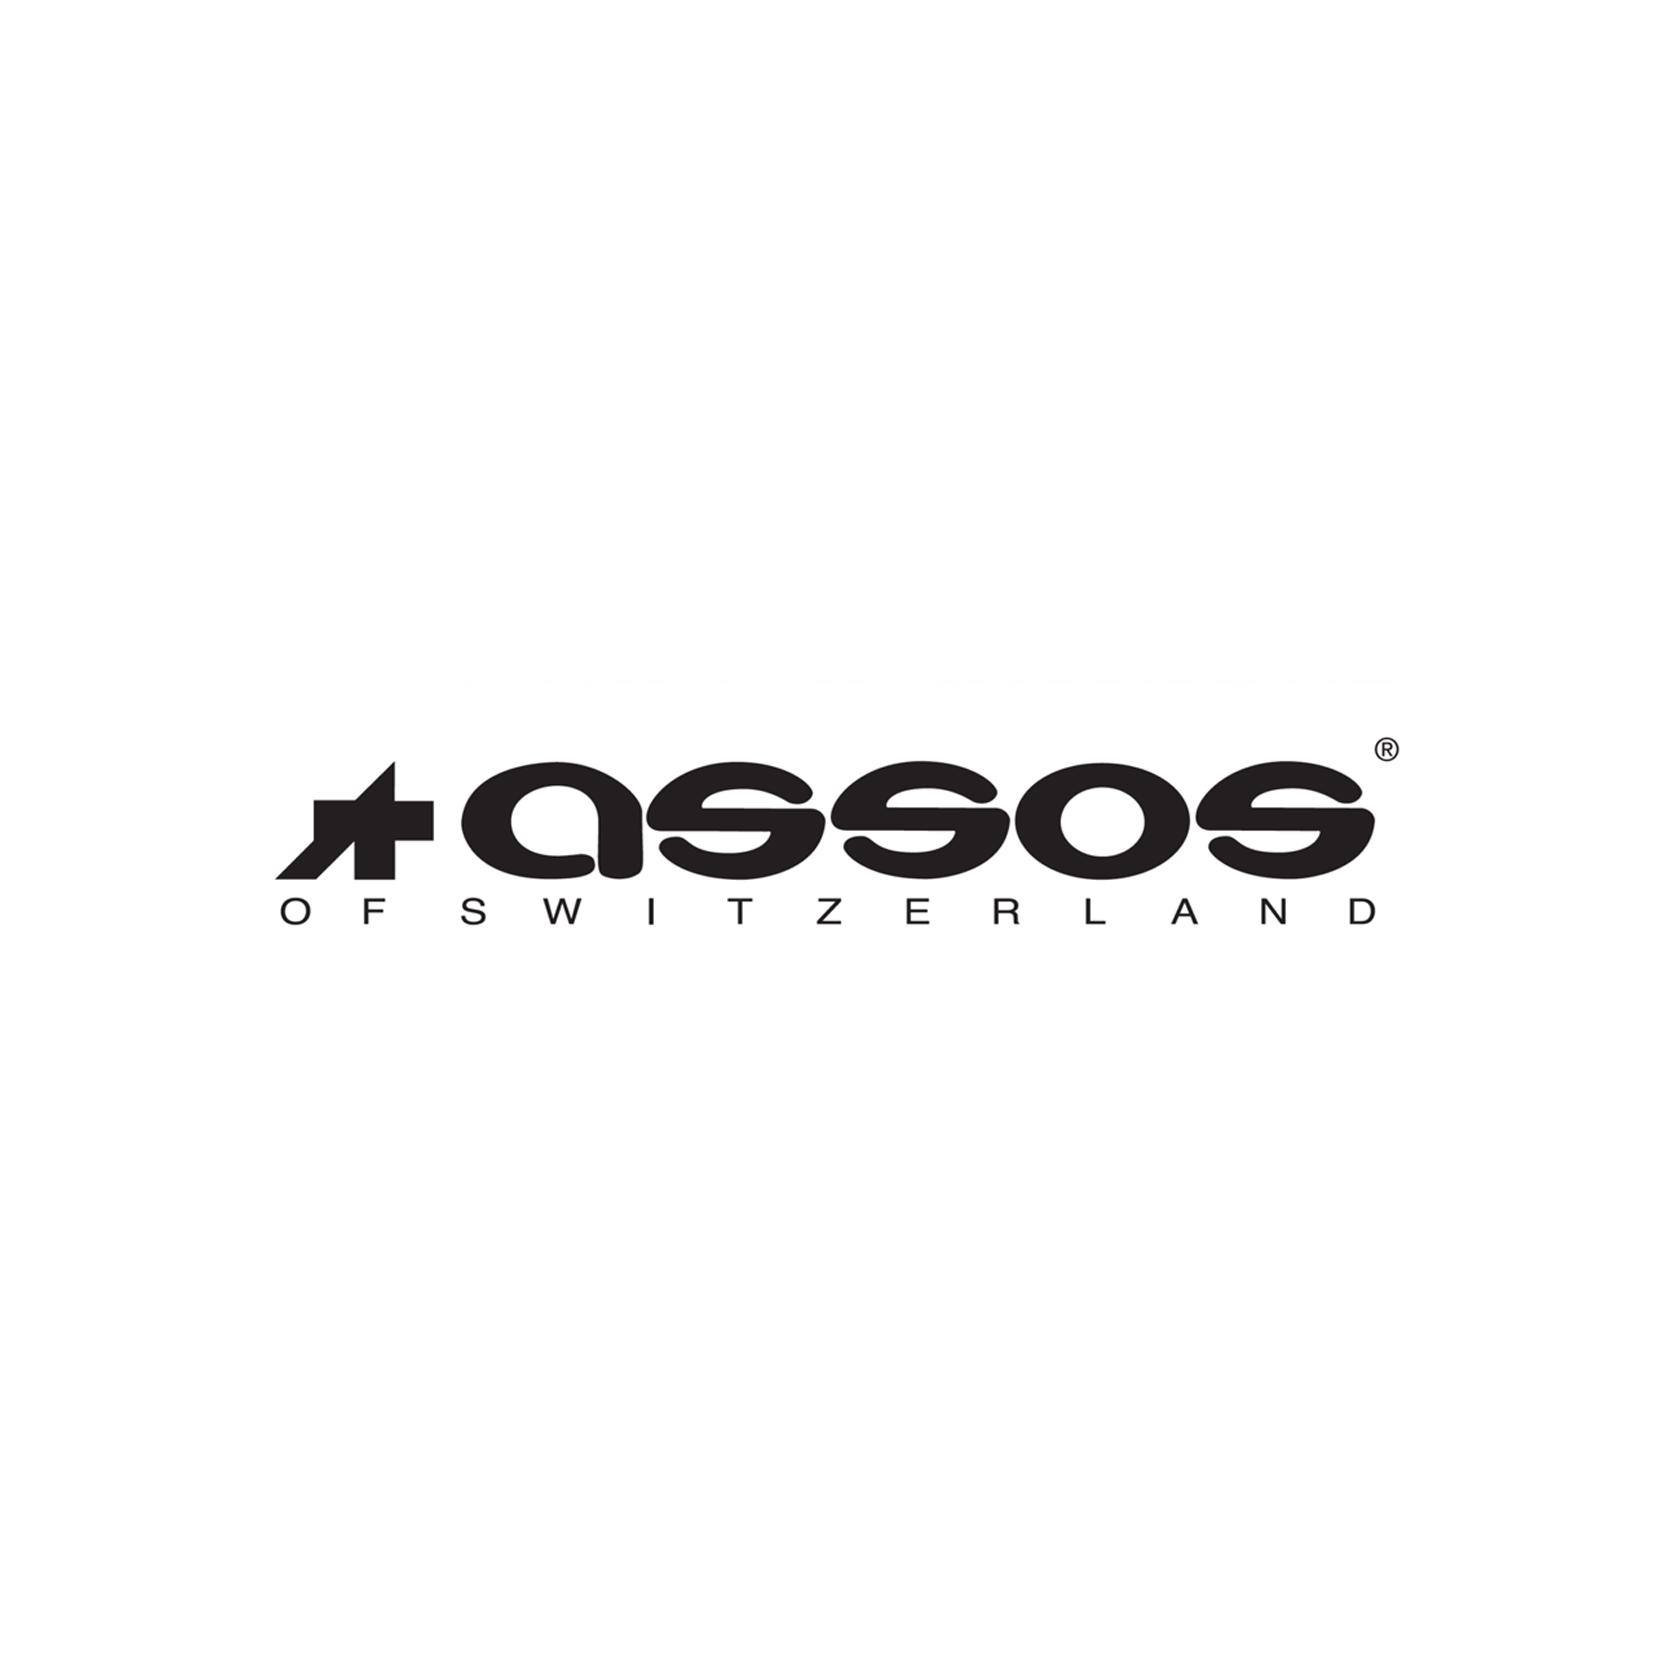 ASSOS of Switzerland